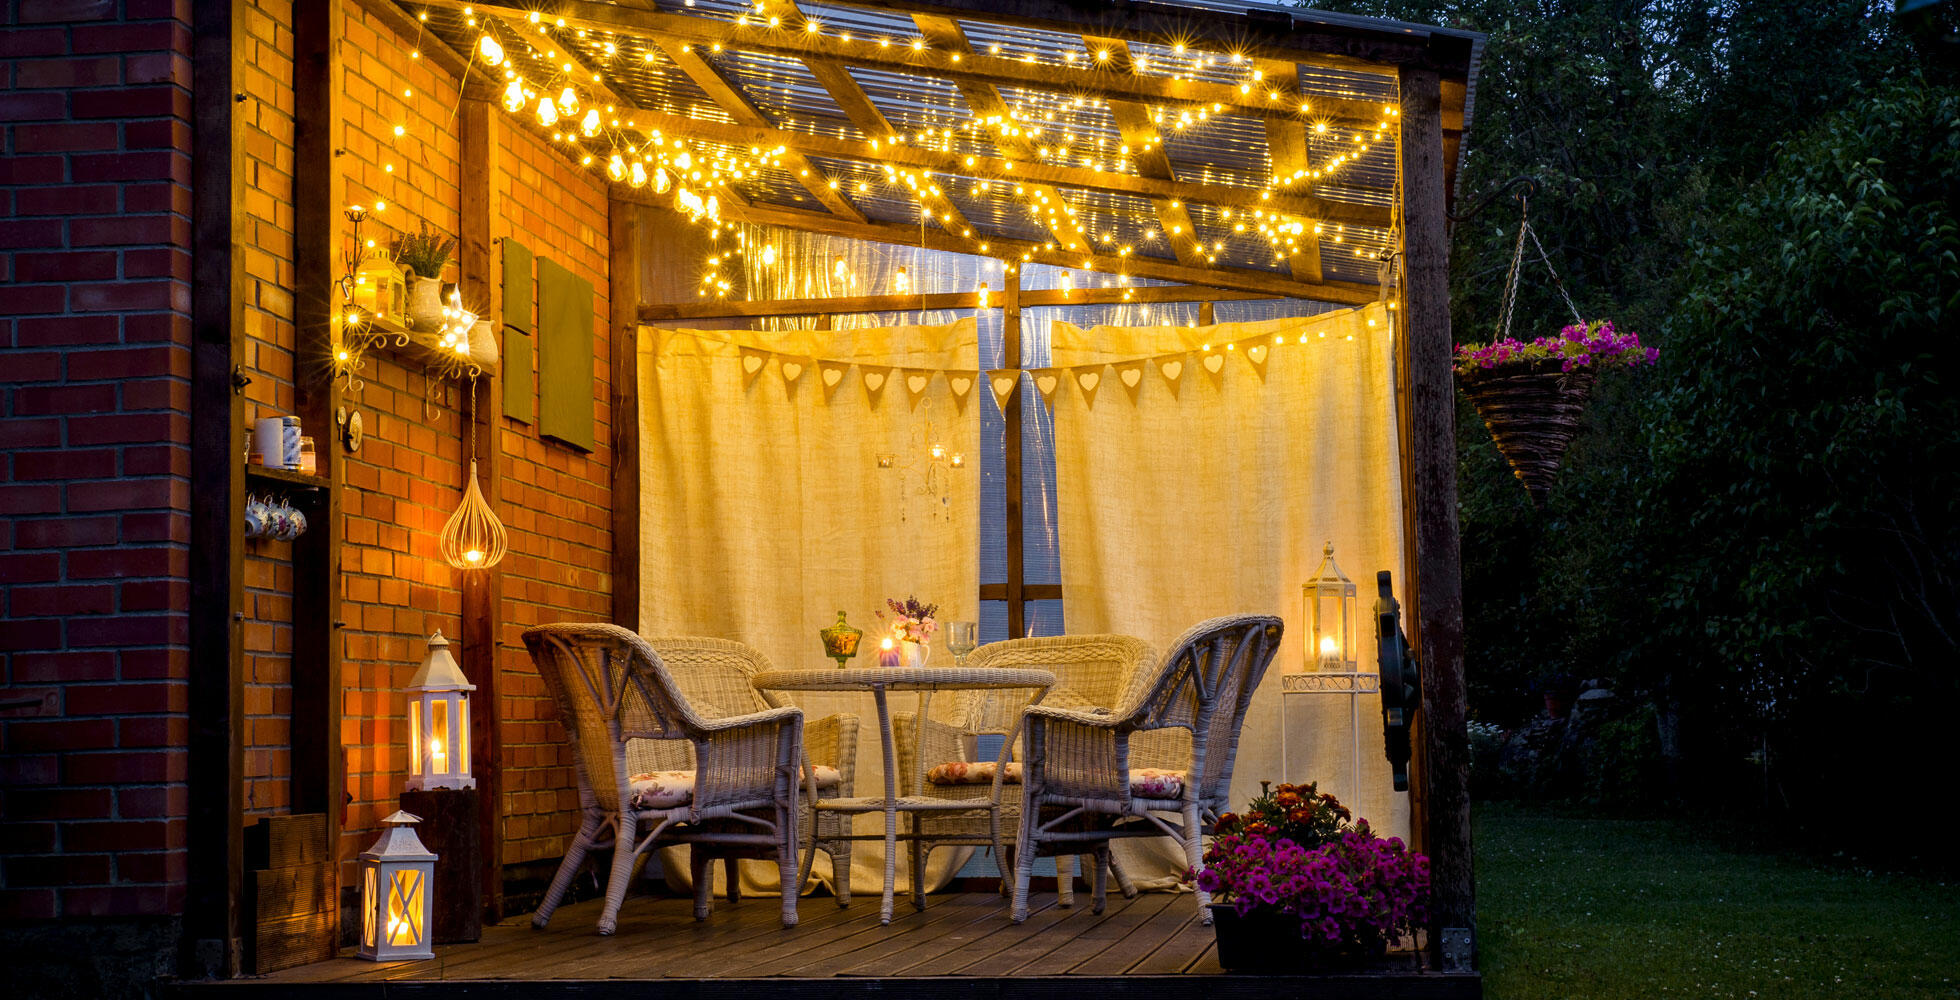 Jardin cosy avec décoration lumineuse